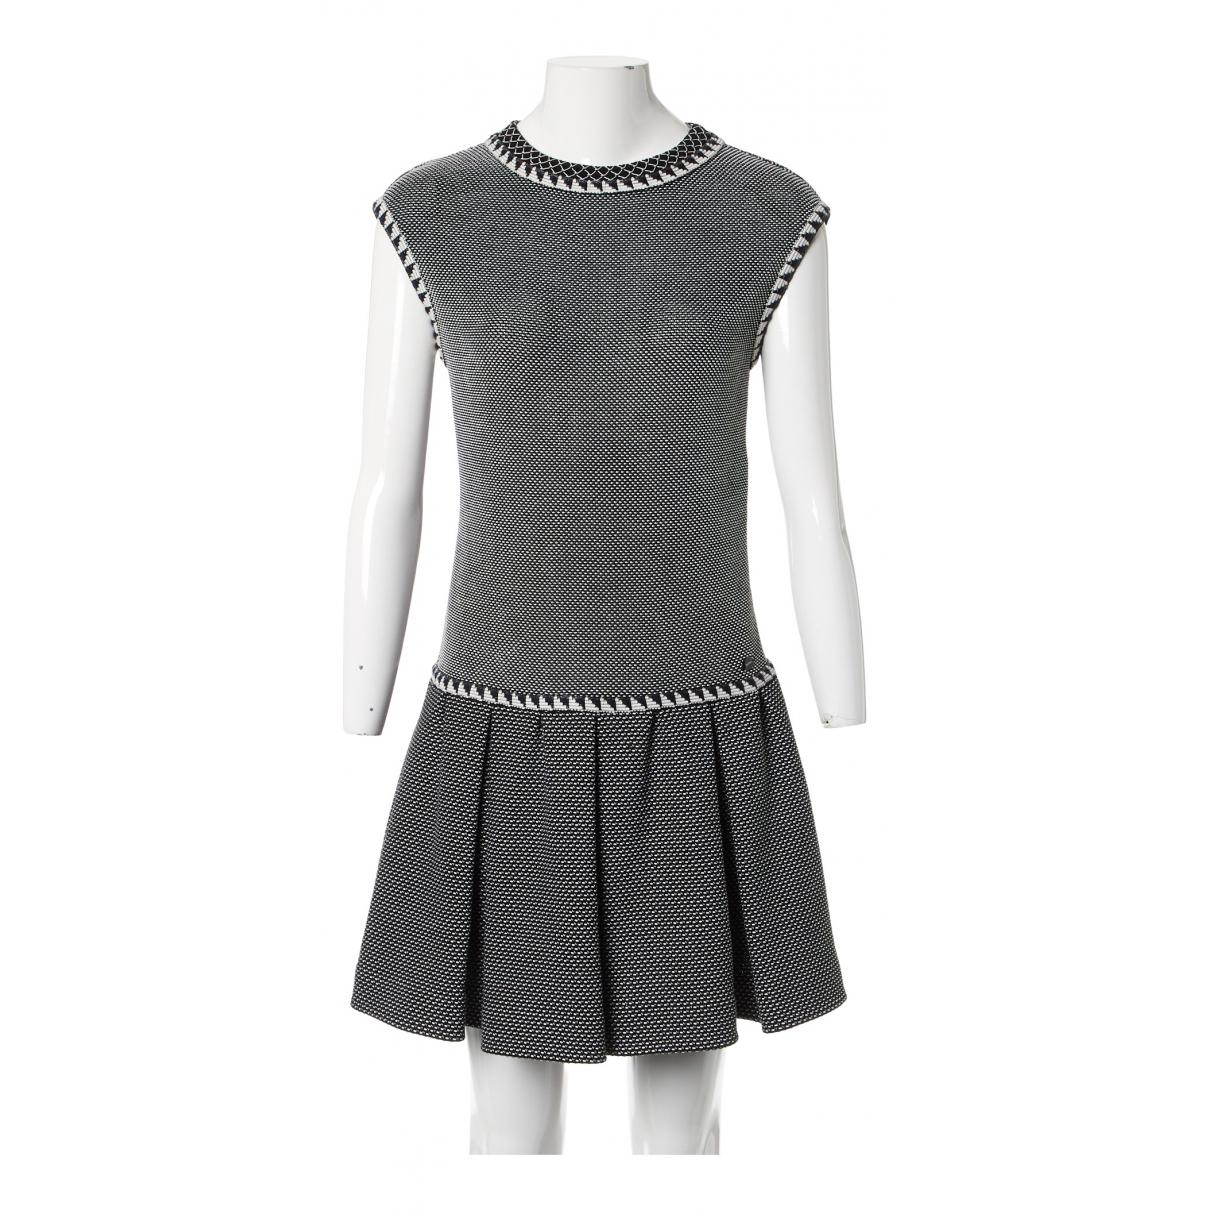 Chanel N Multicolour Cotton dress for Women 36 FR